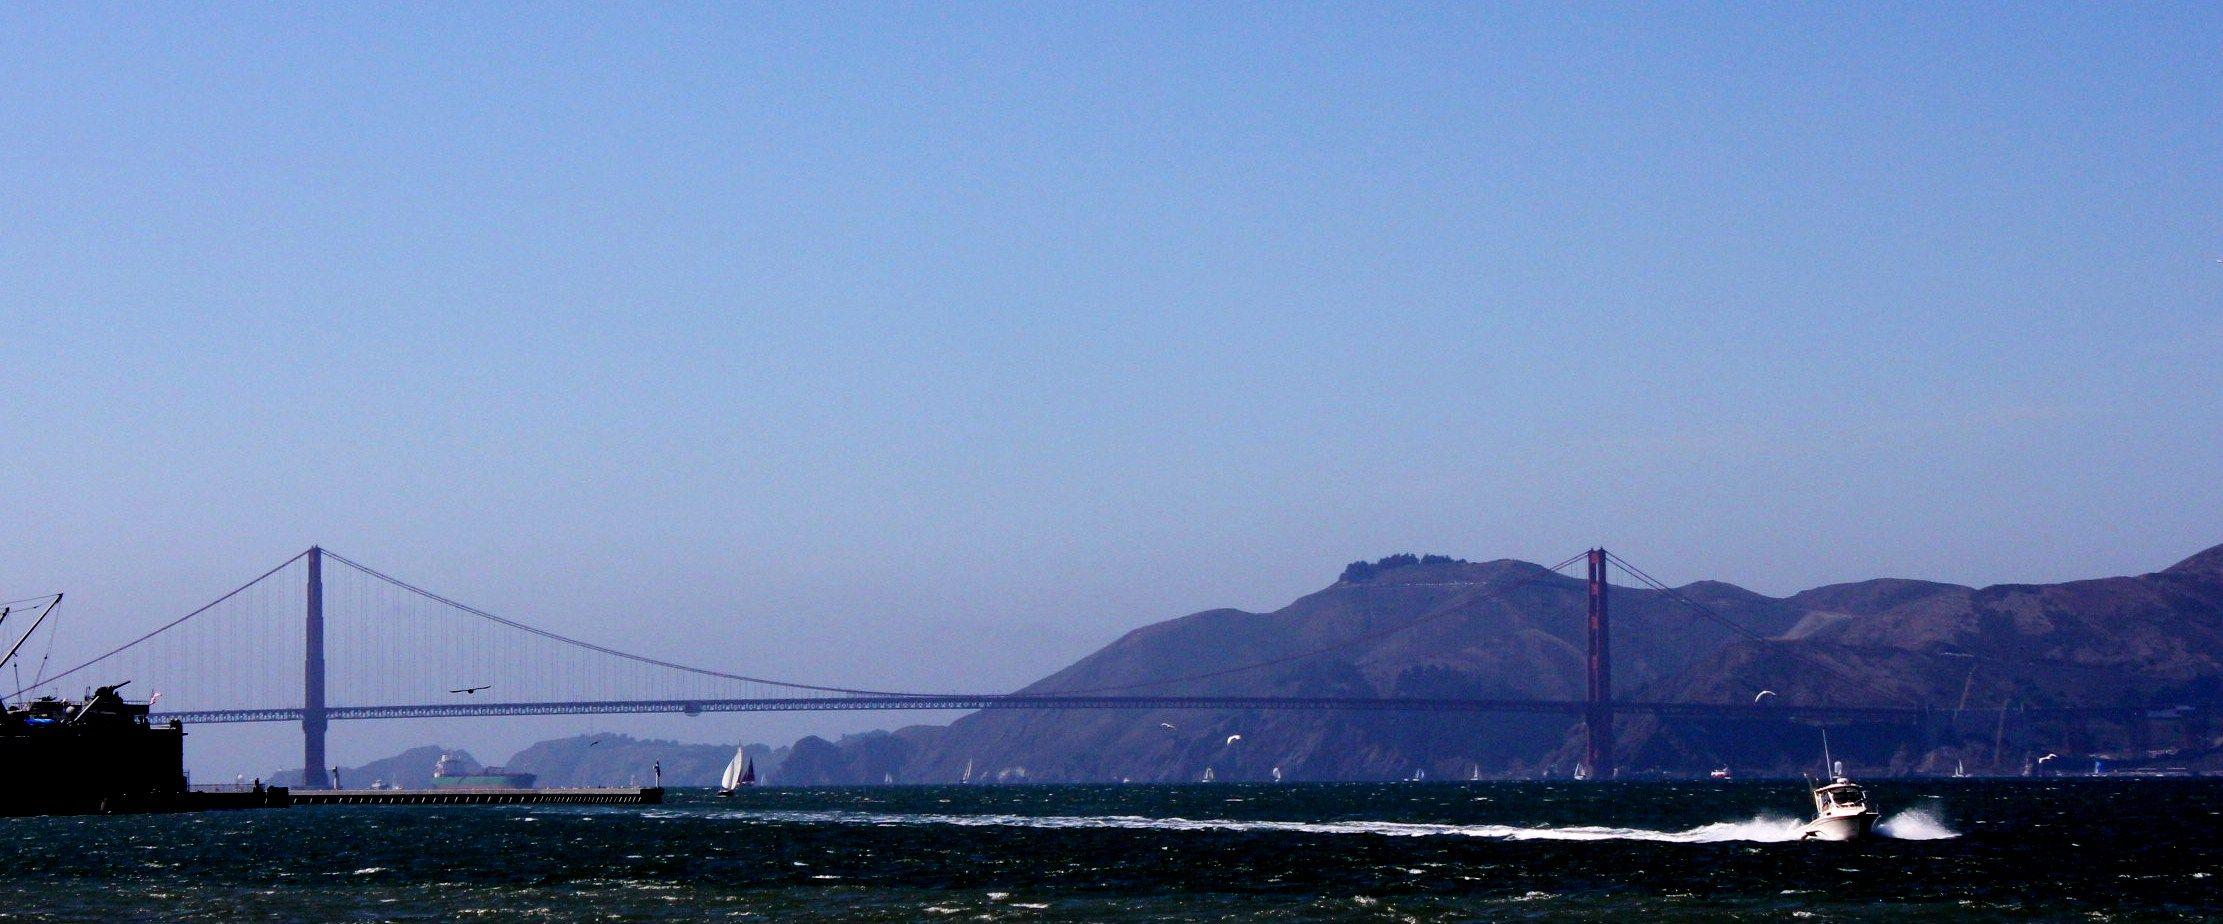 Golden Gate, just fascinating.